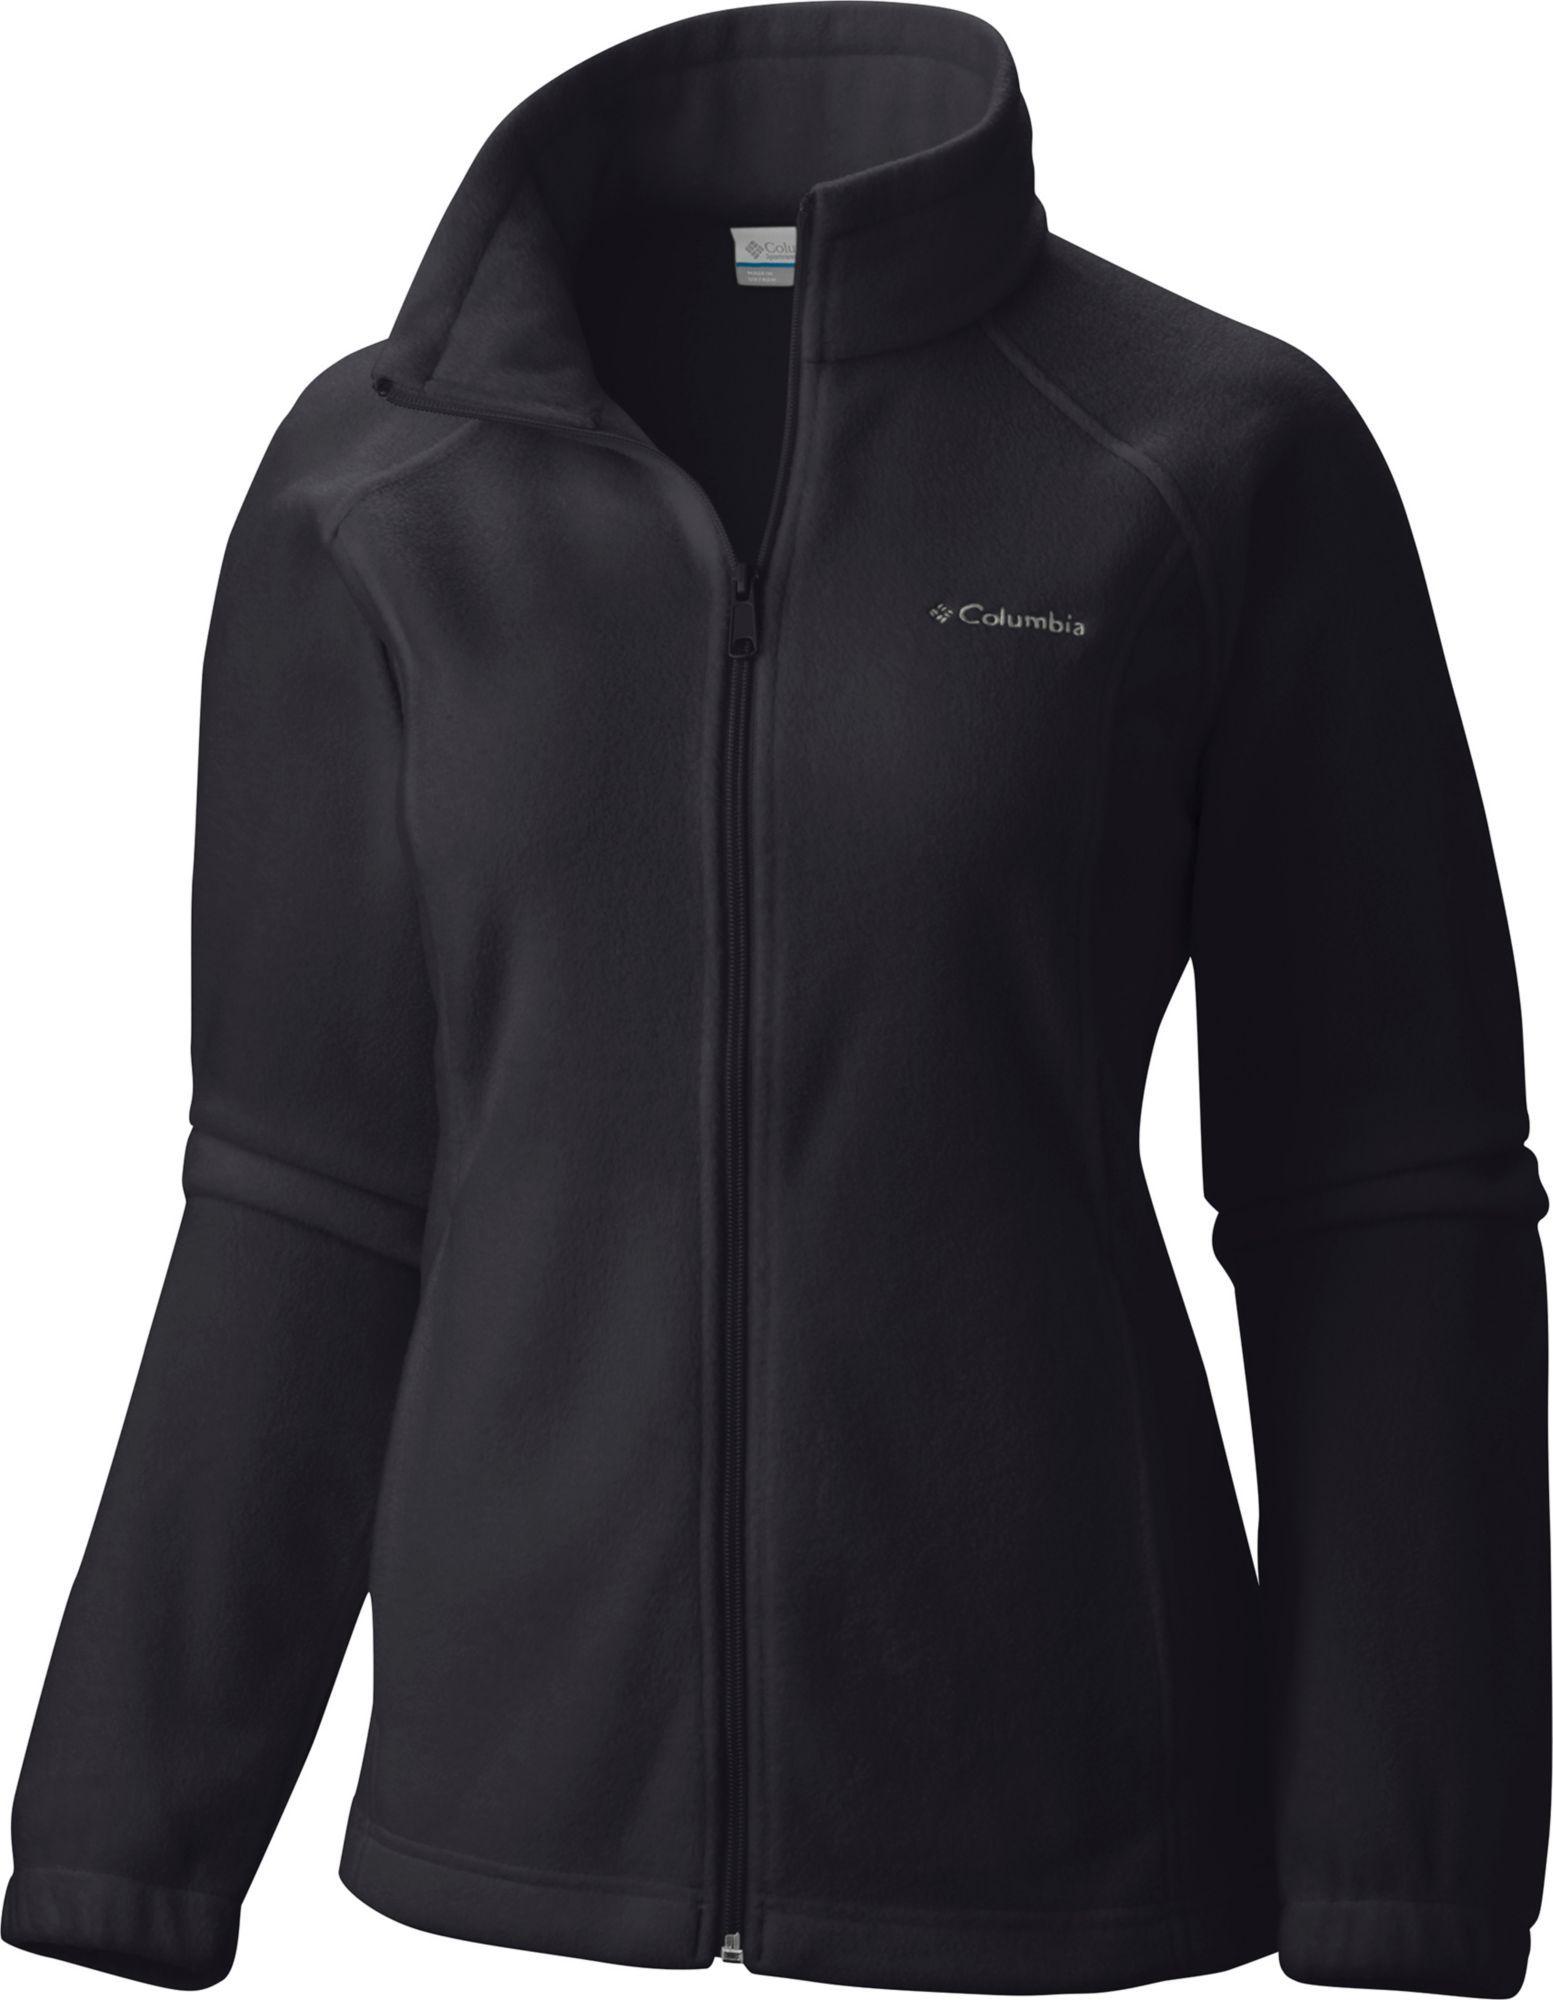 02e12f428 Columbia Women's Benton Springs Full Zip Fleece Jacket, Size: Small, Black